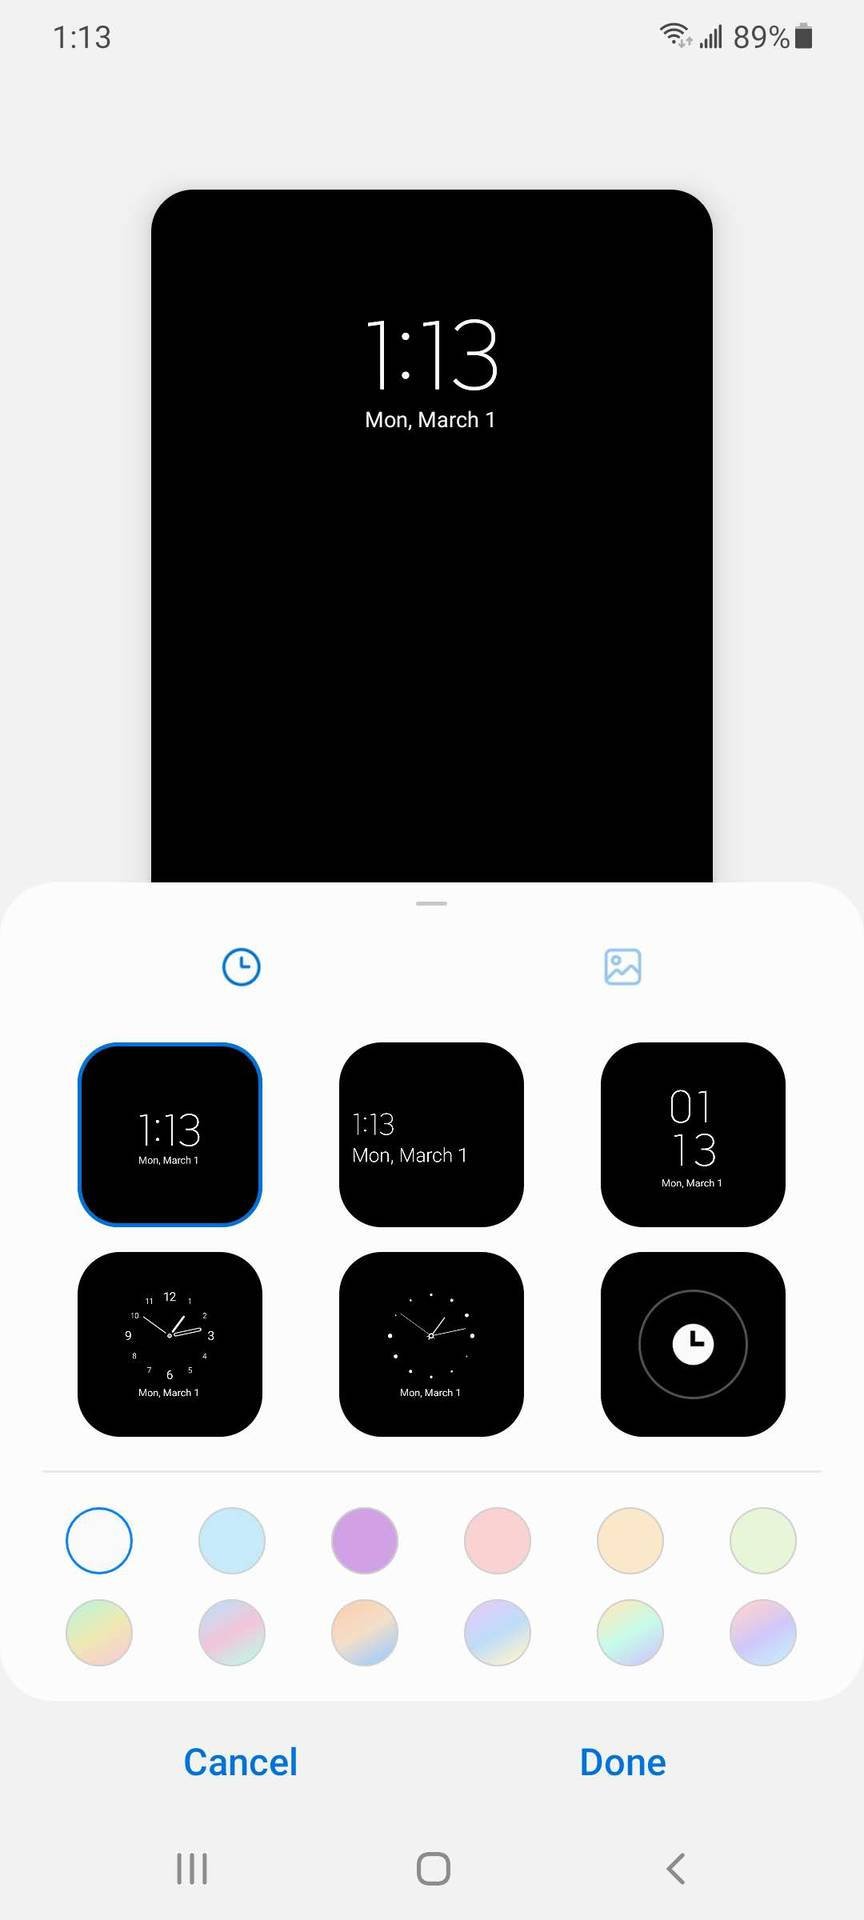 Samsung One UI 3.0 AOD Customizations